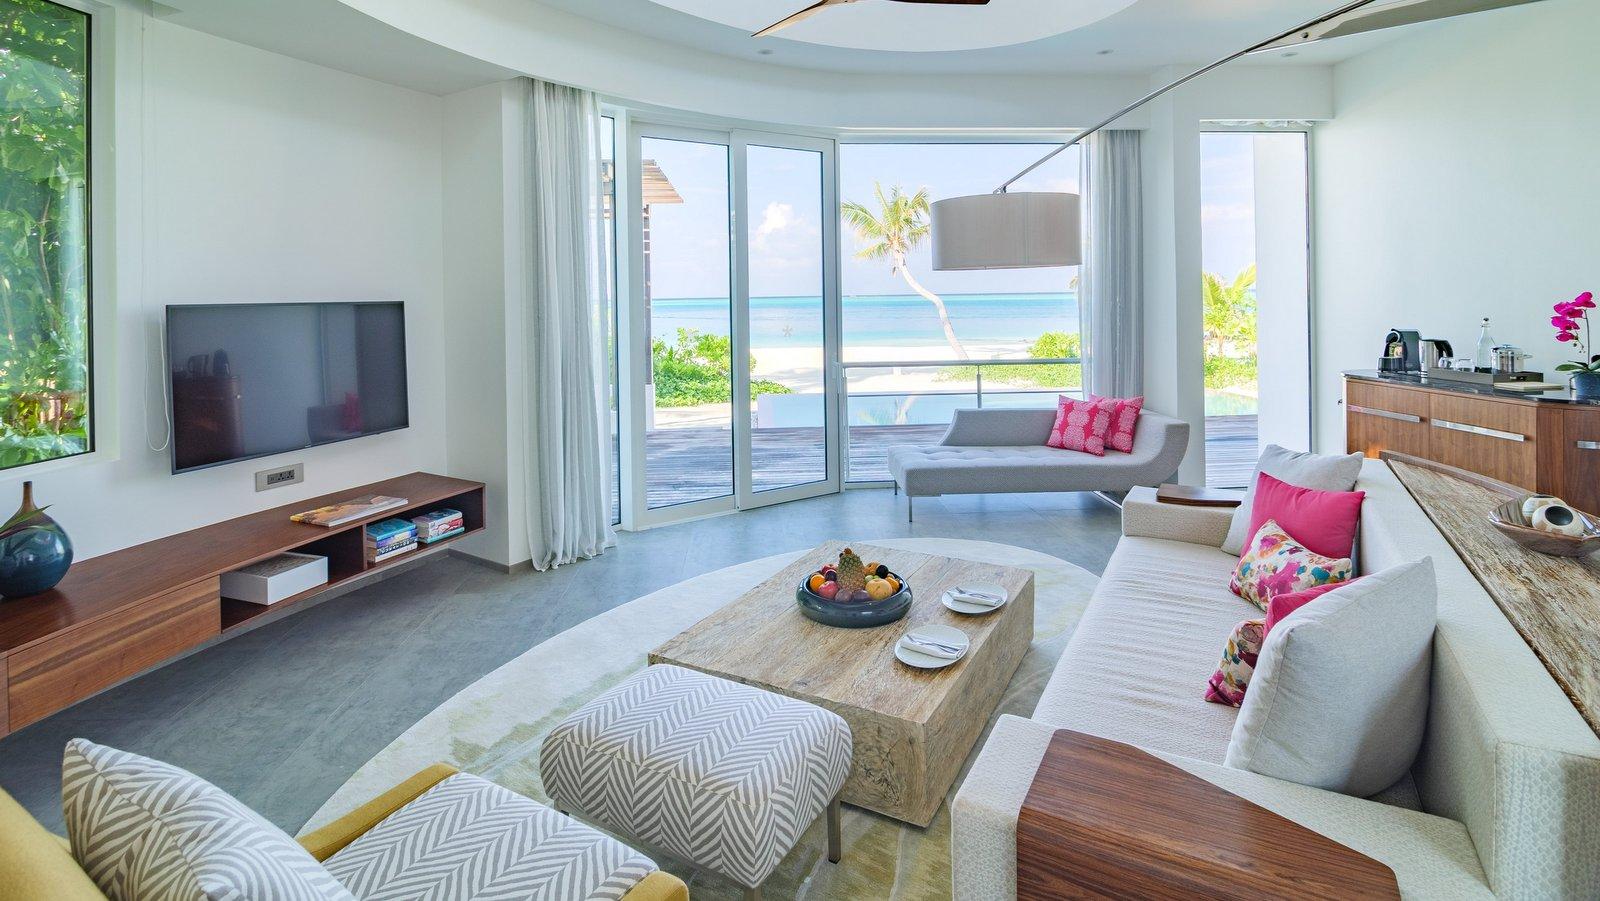 Мальдивы, отель LUX North Male Atoll, номер Beach Villa with Pool